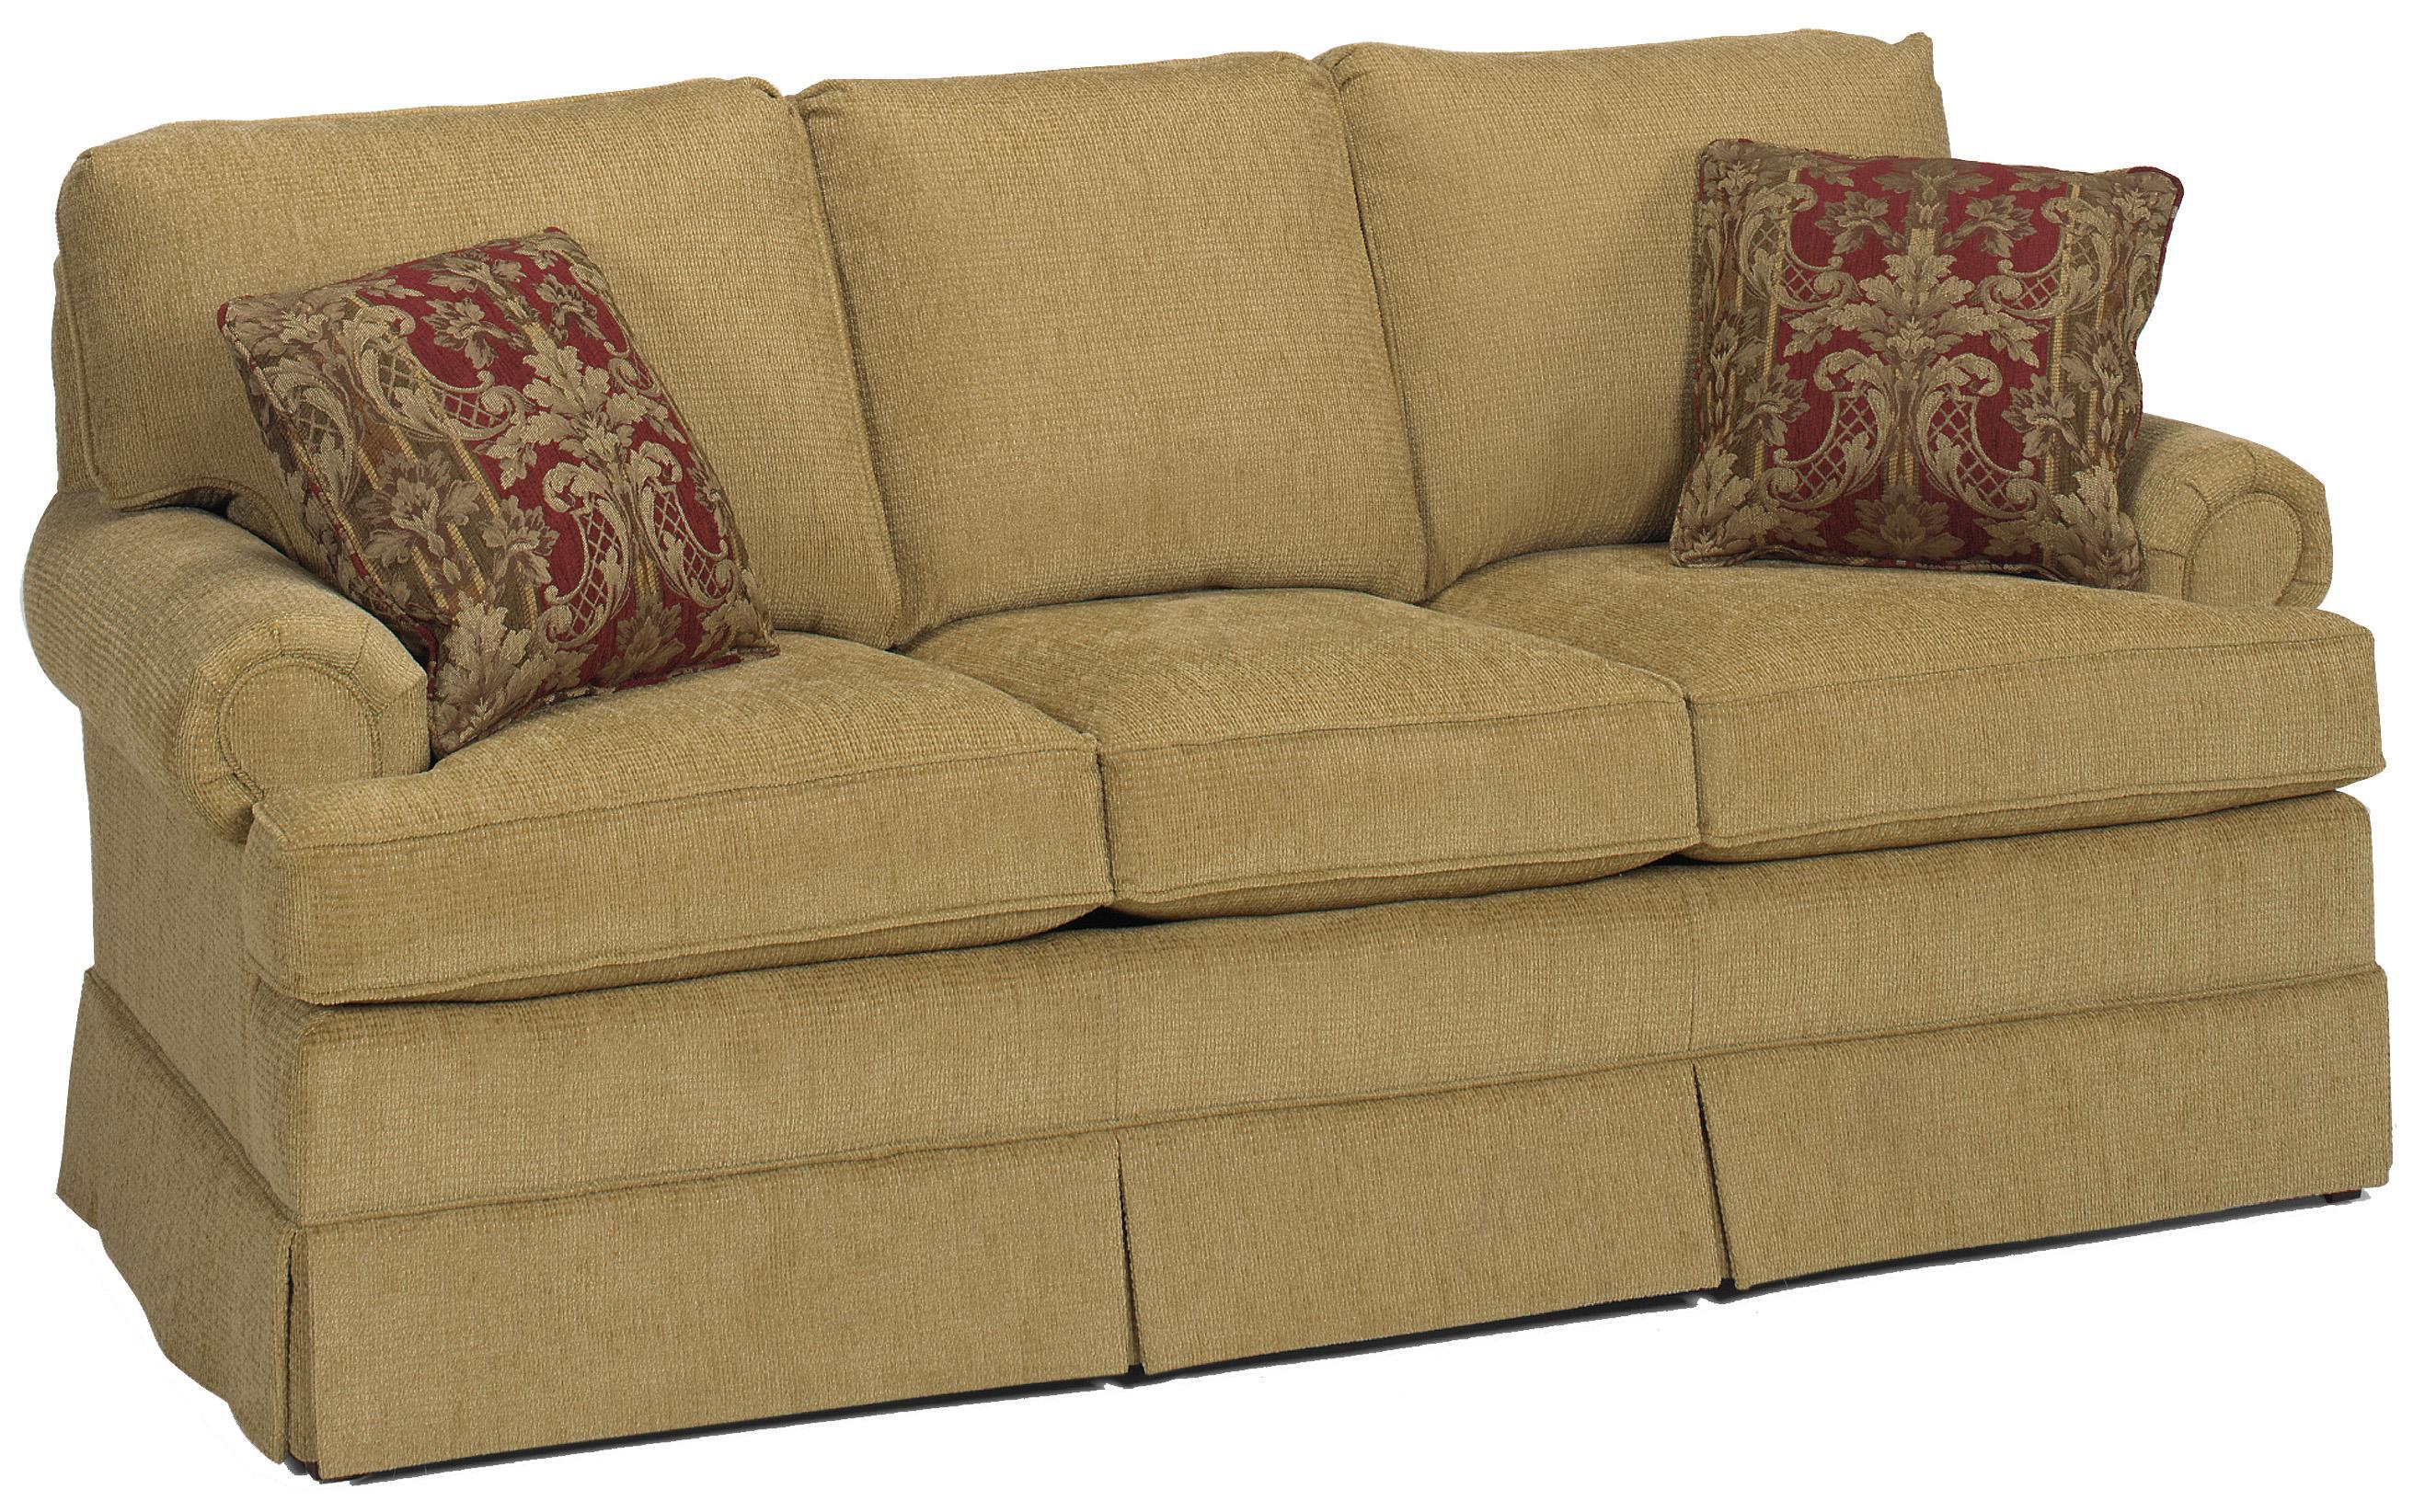 Etonnant Temple Furniture AmericanSofa